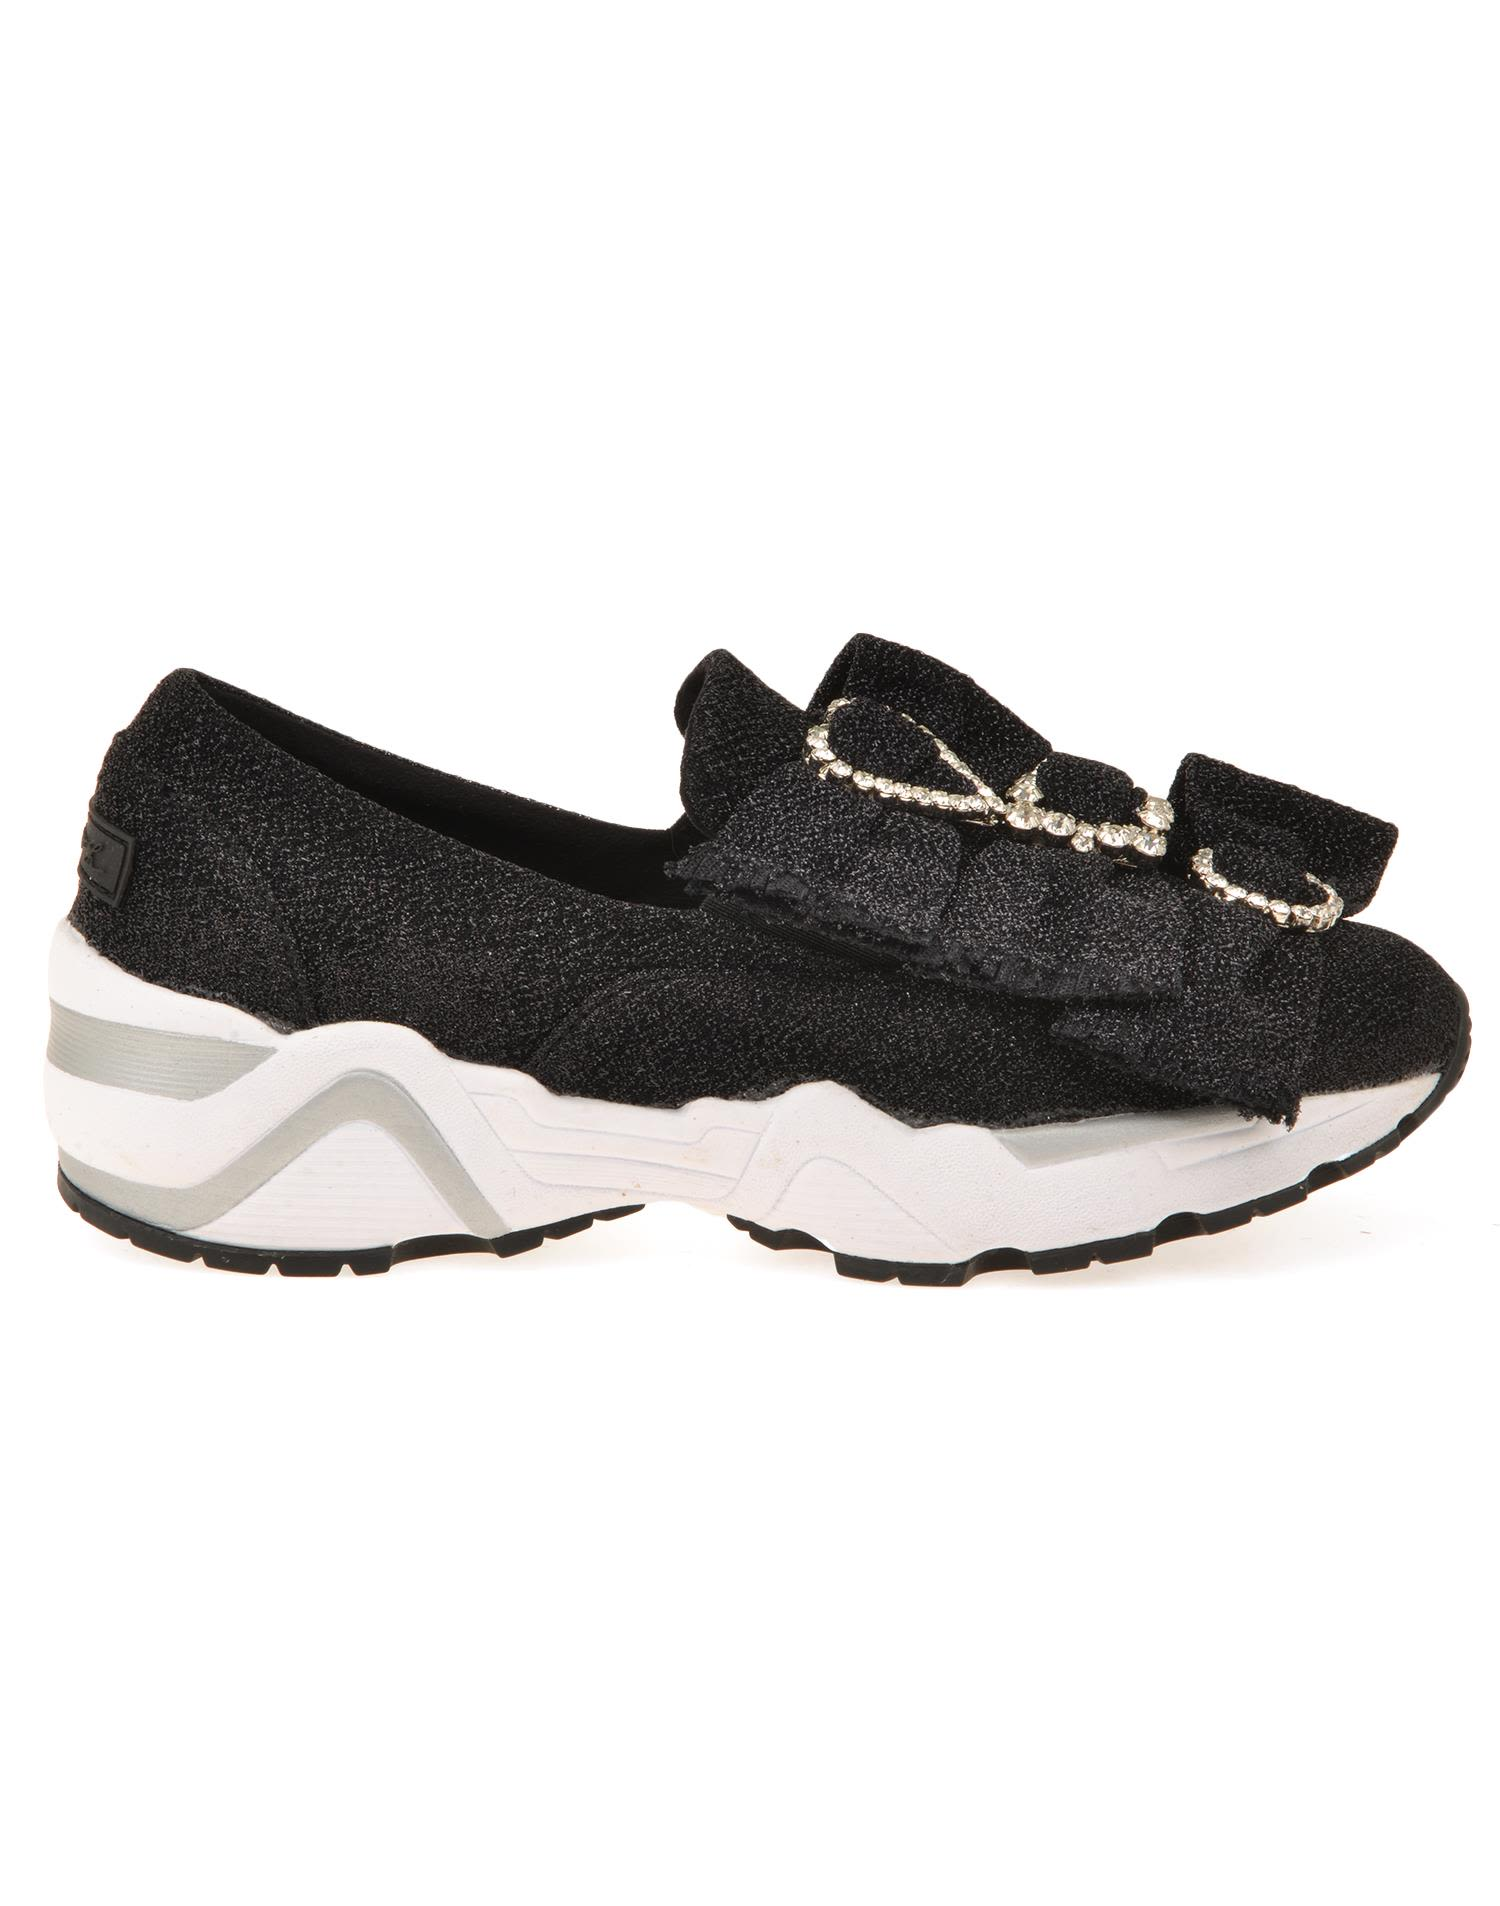 Suecomma Bonnie Slip-on Sneaker